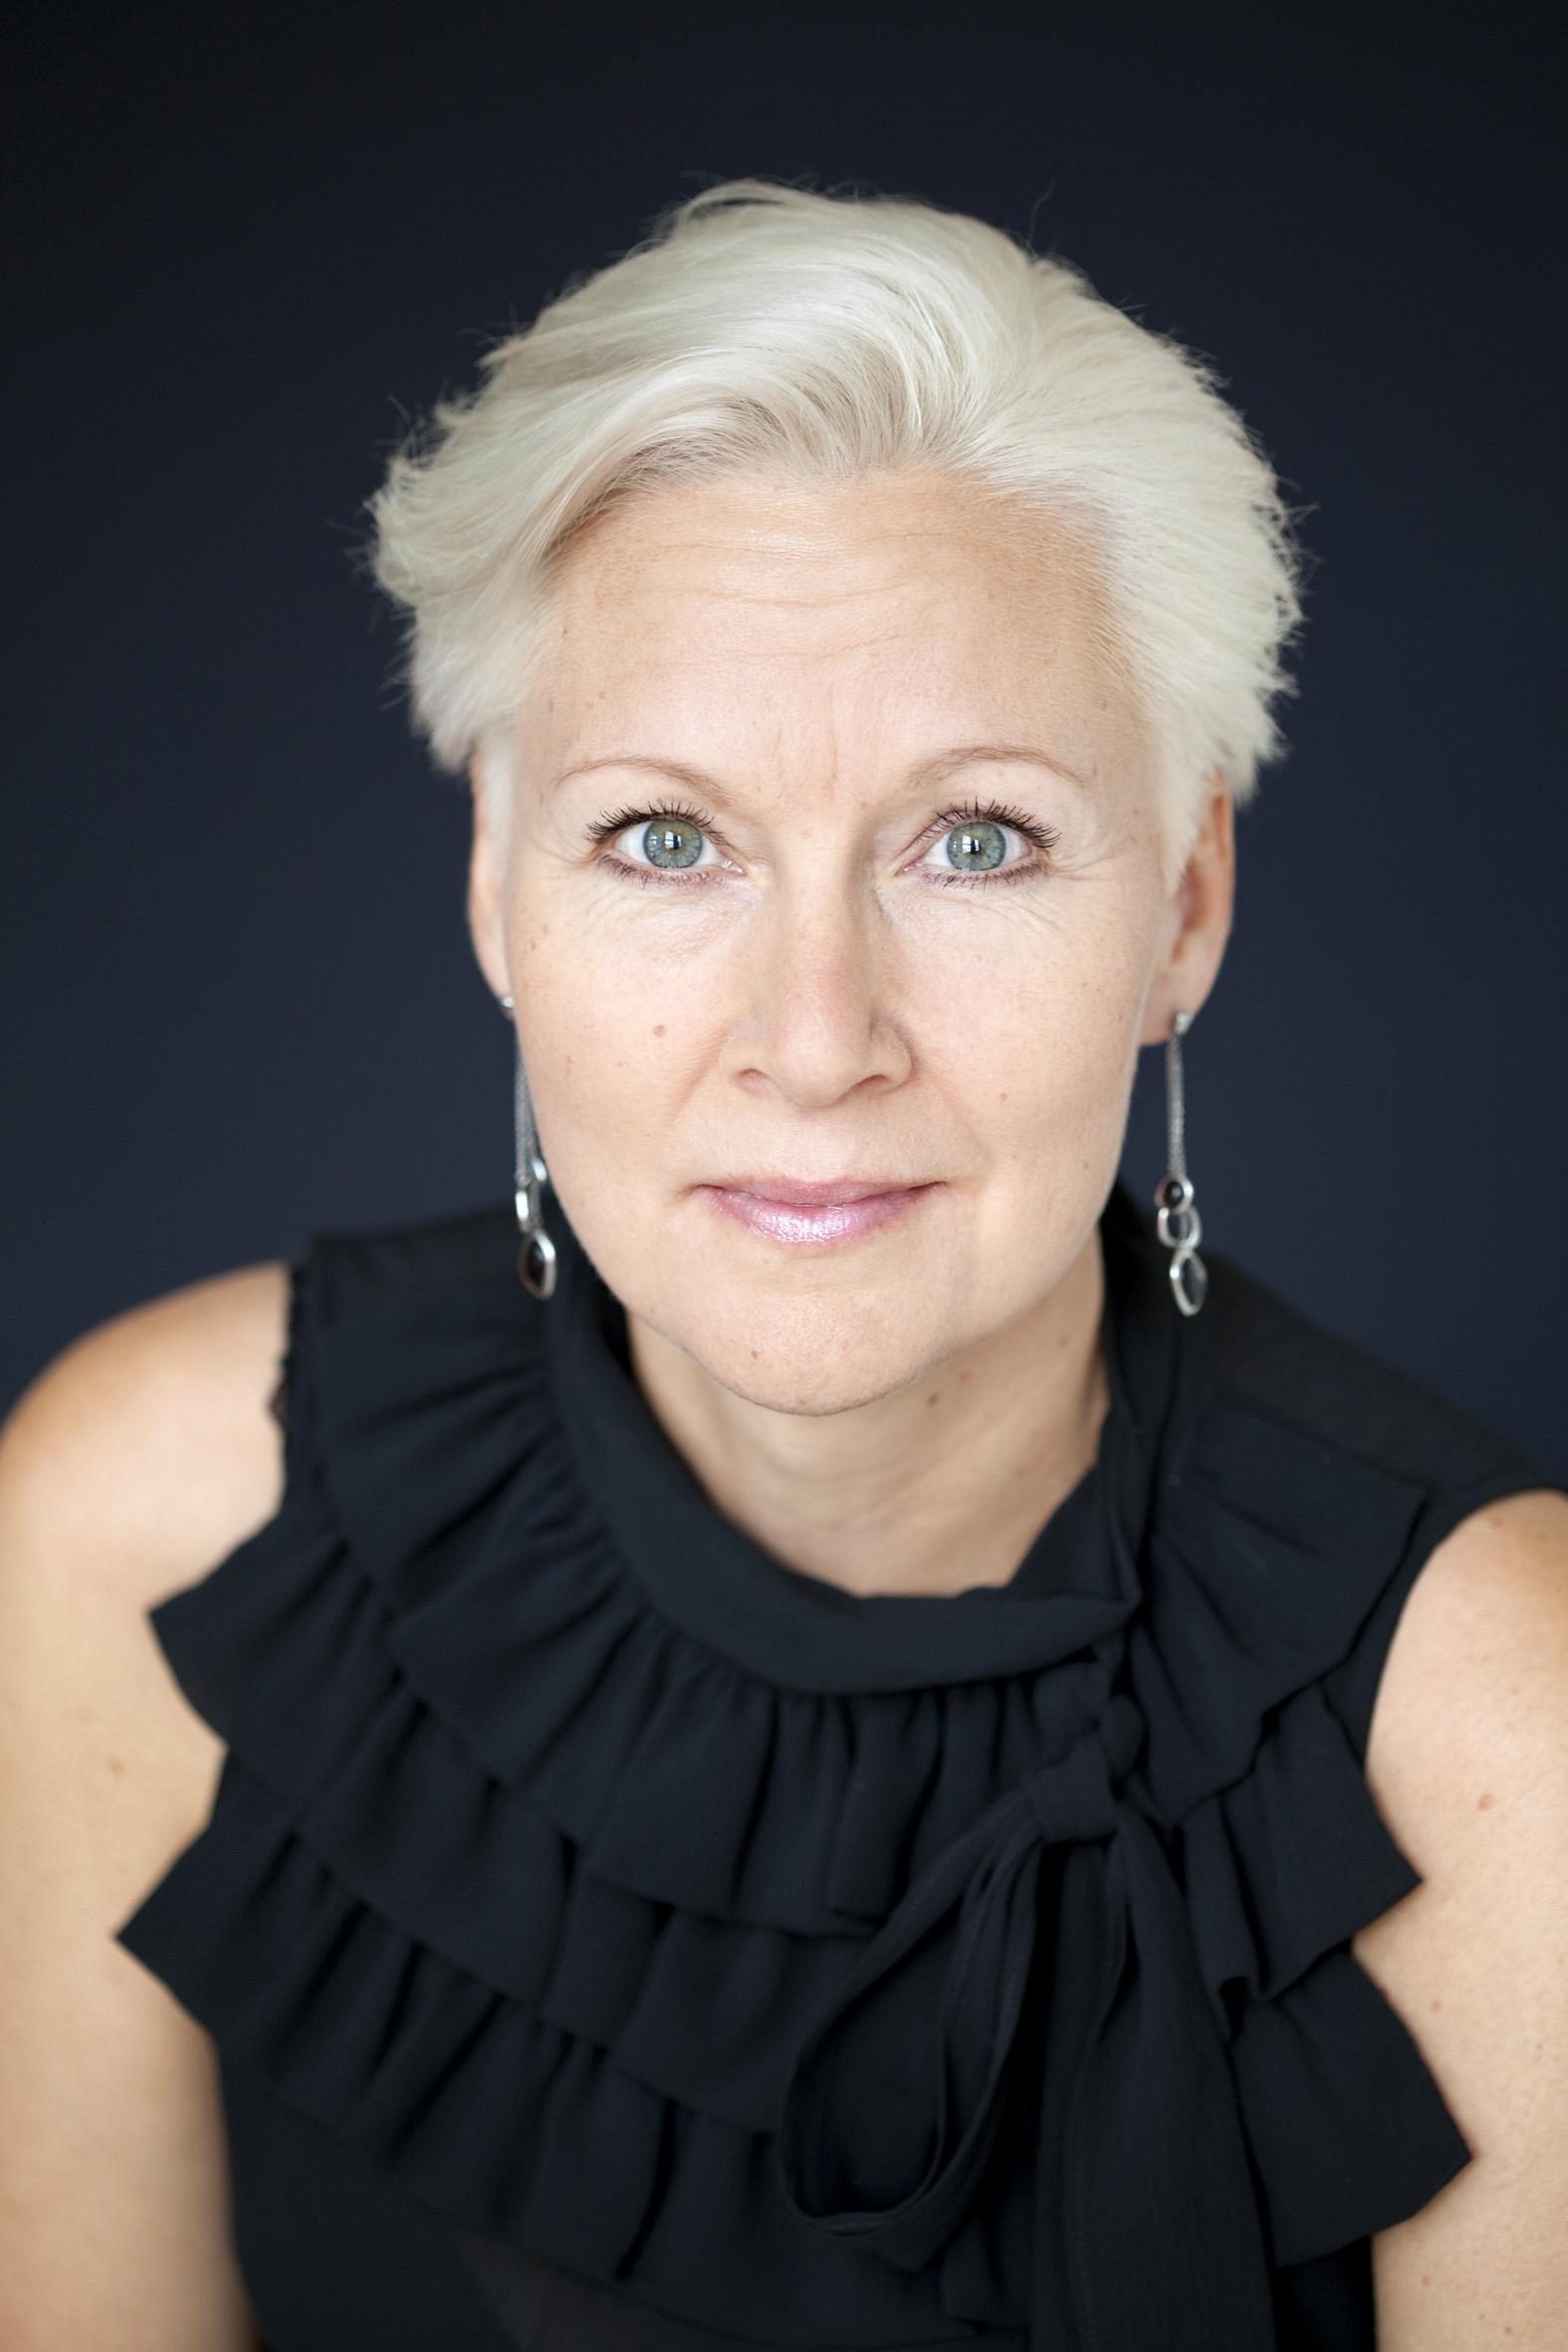 Monica Danielson